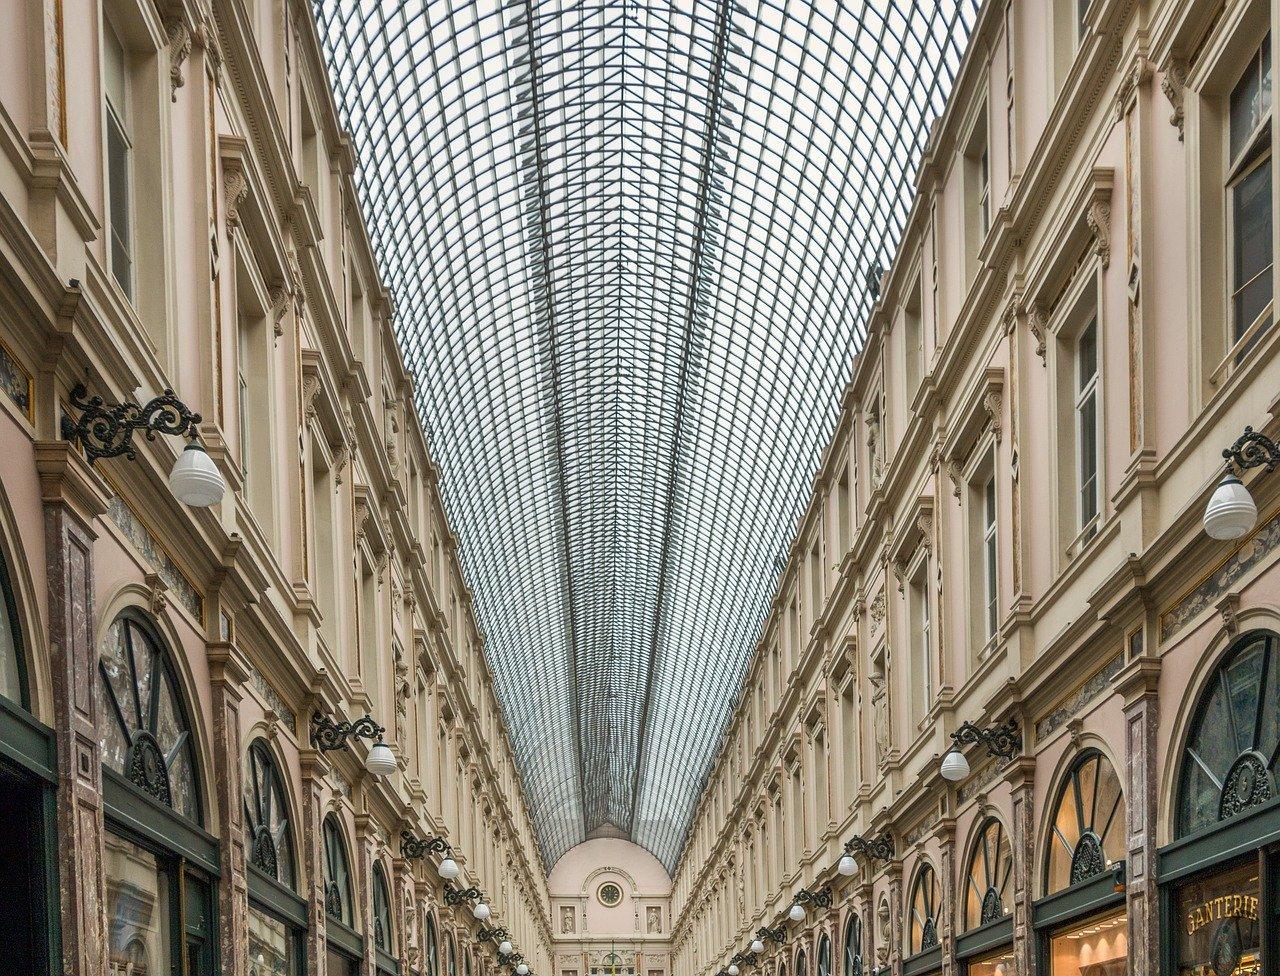 Les Galeries Bruxelles